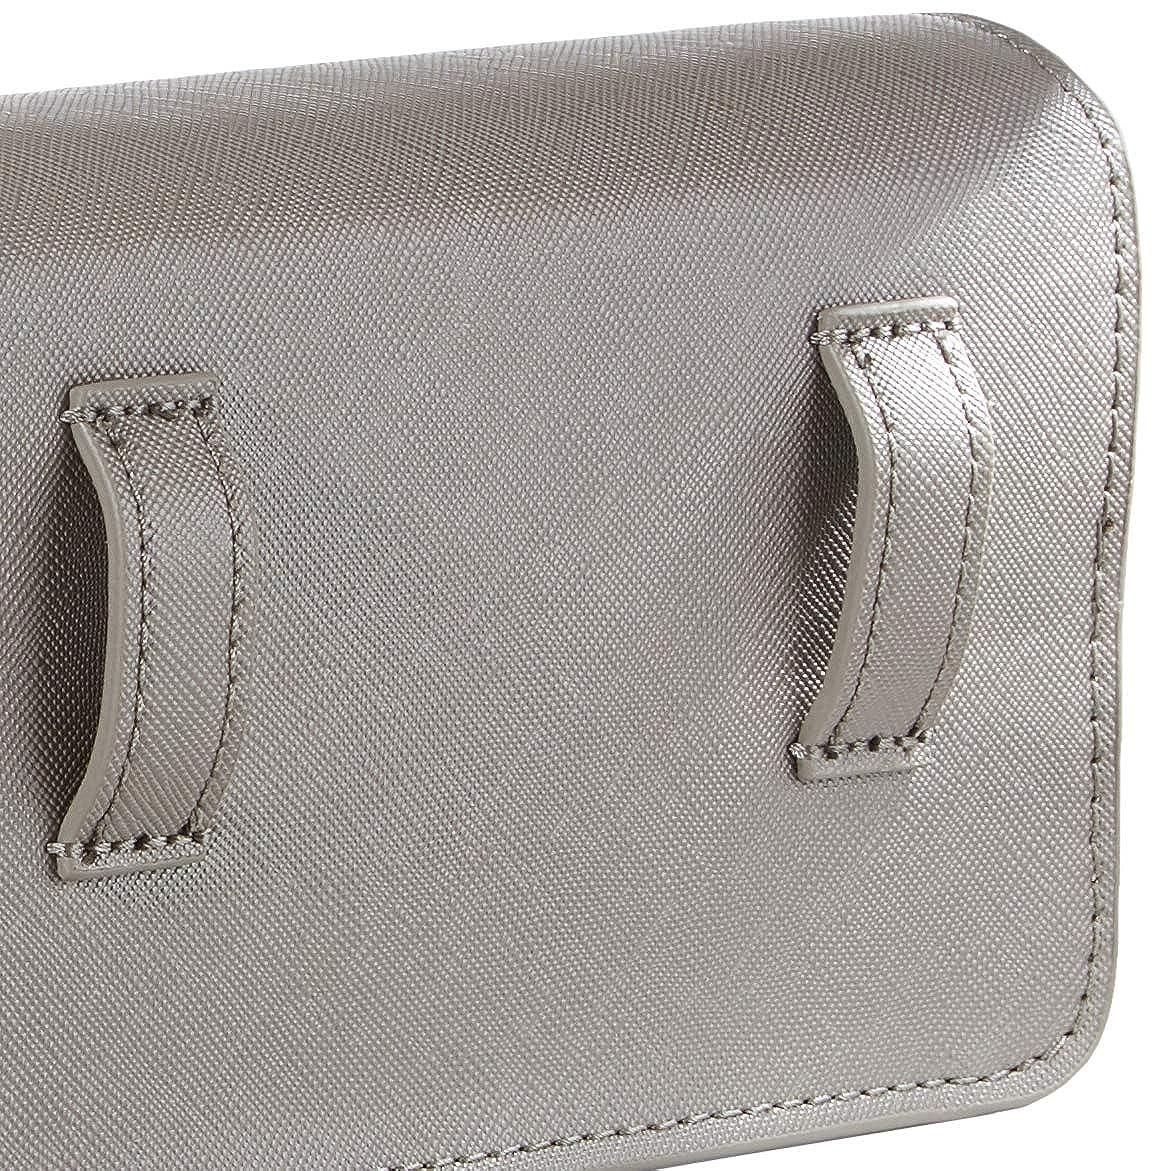 Grey Metallic 6x11.1x17.2 centimeters HONEY BELT BAG METALLICMujerBolsos bandoleraGris B x H x T